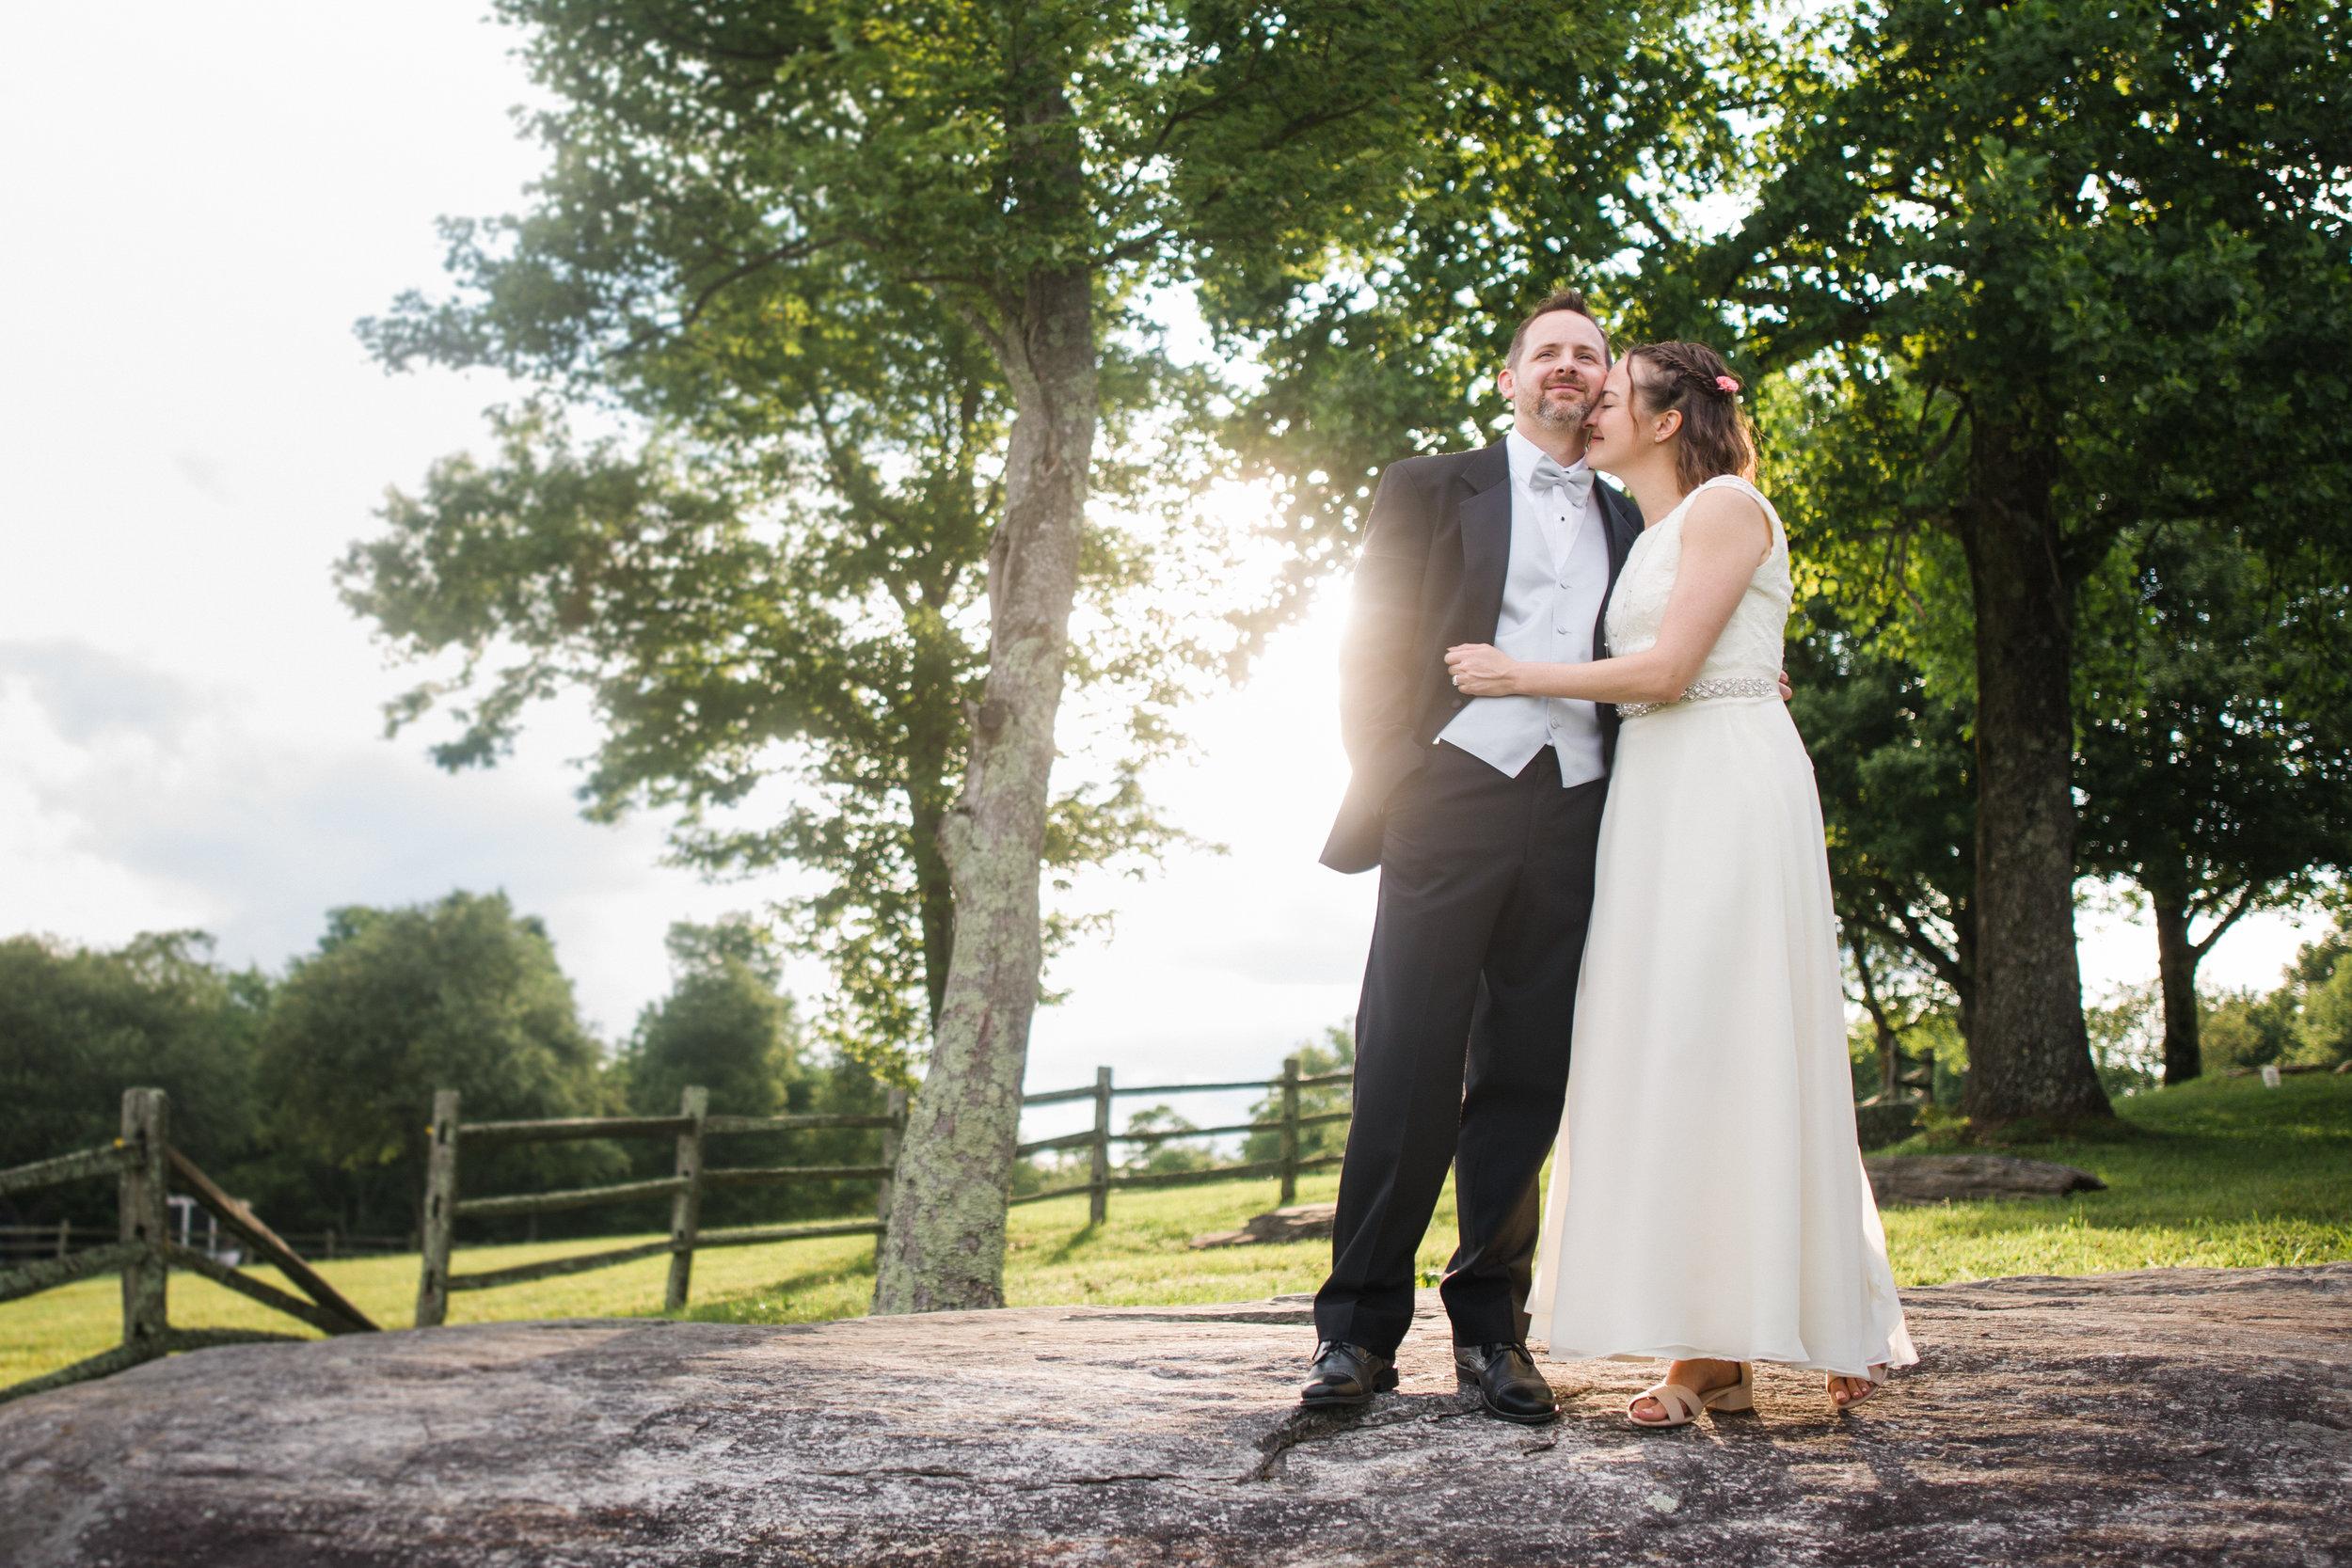 NC Wedding Photography by Zoe Litaker